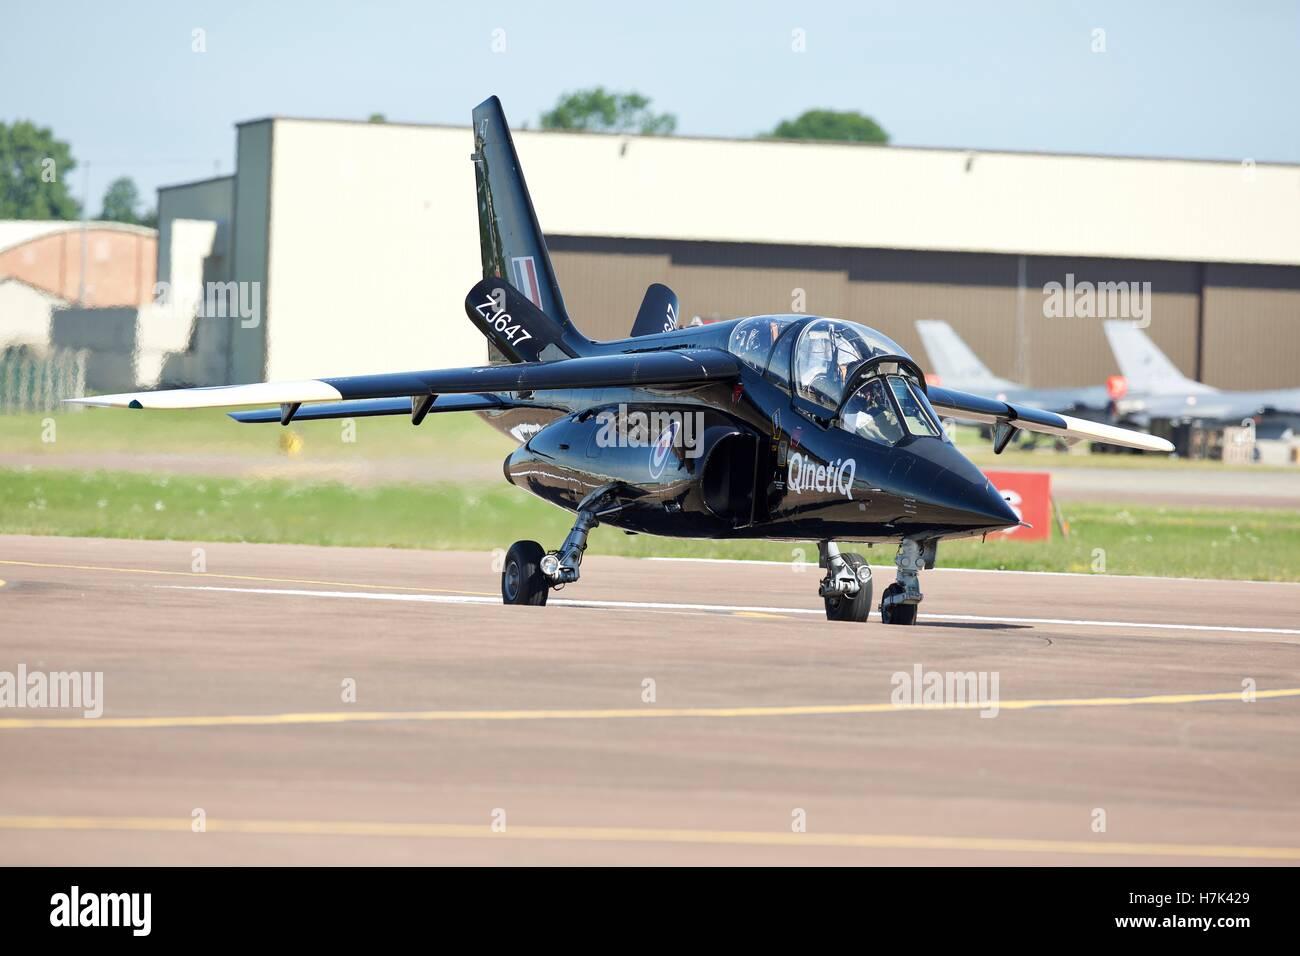 Qinetiq Alpha Jet. - Stock Image